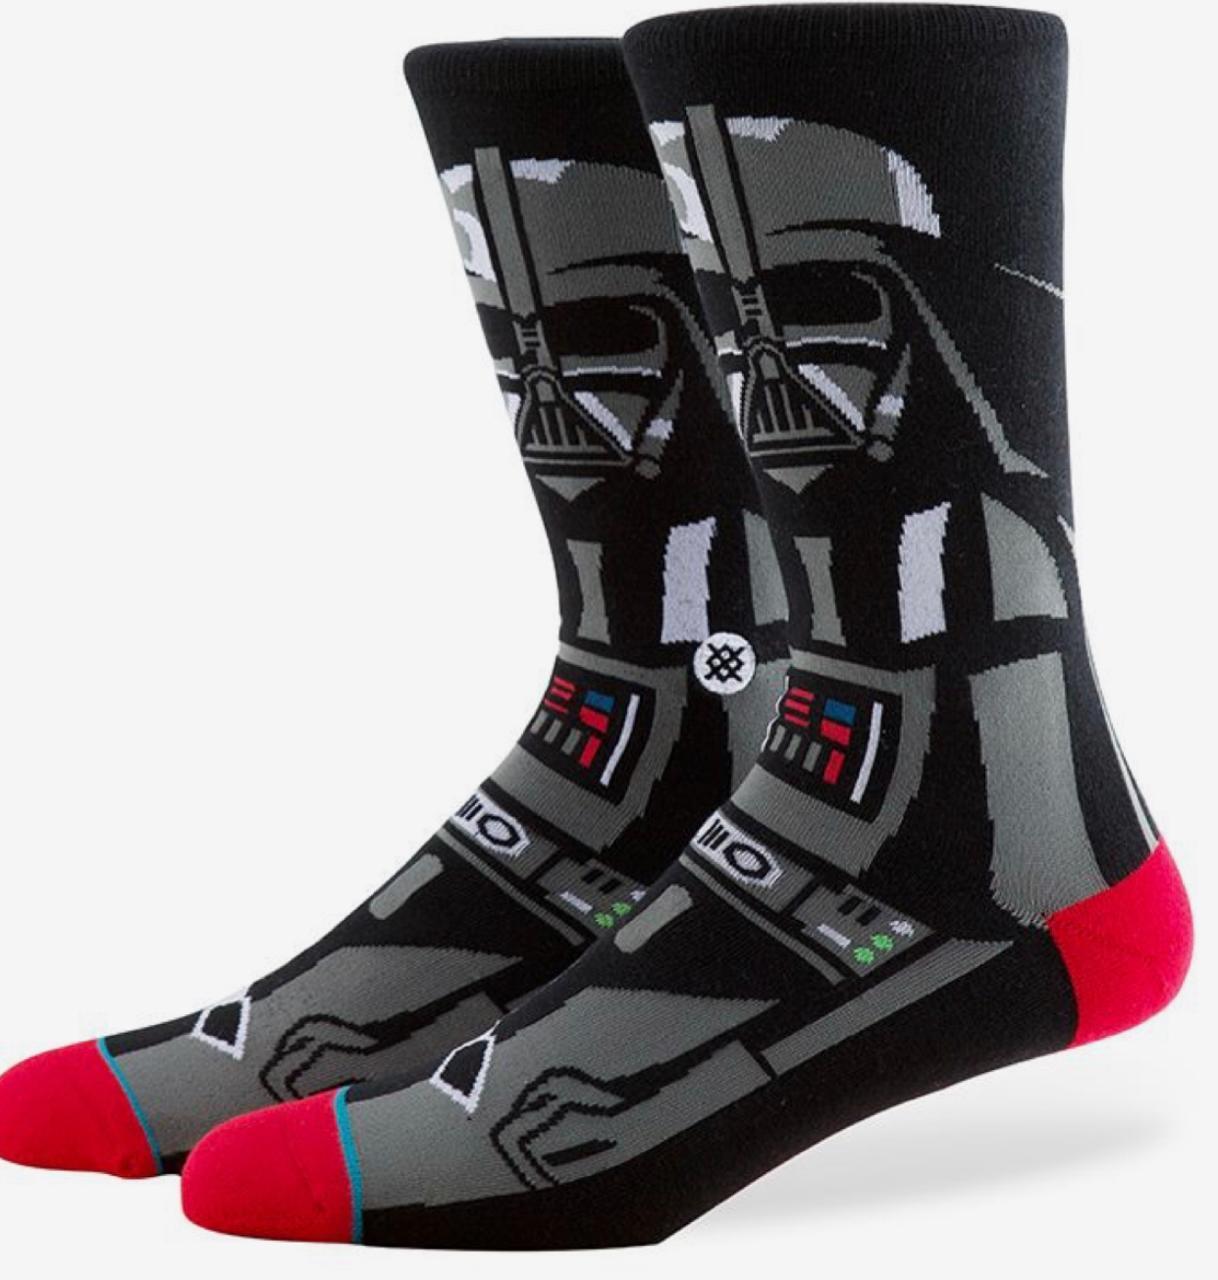 Par de Meias Geek: Darth Vader - It Sox